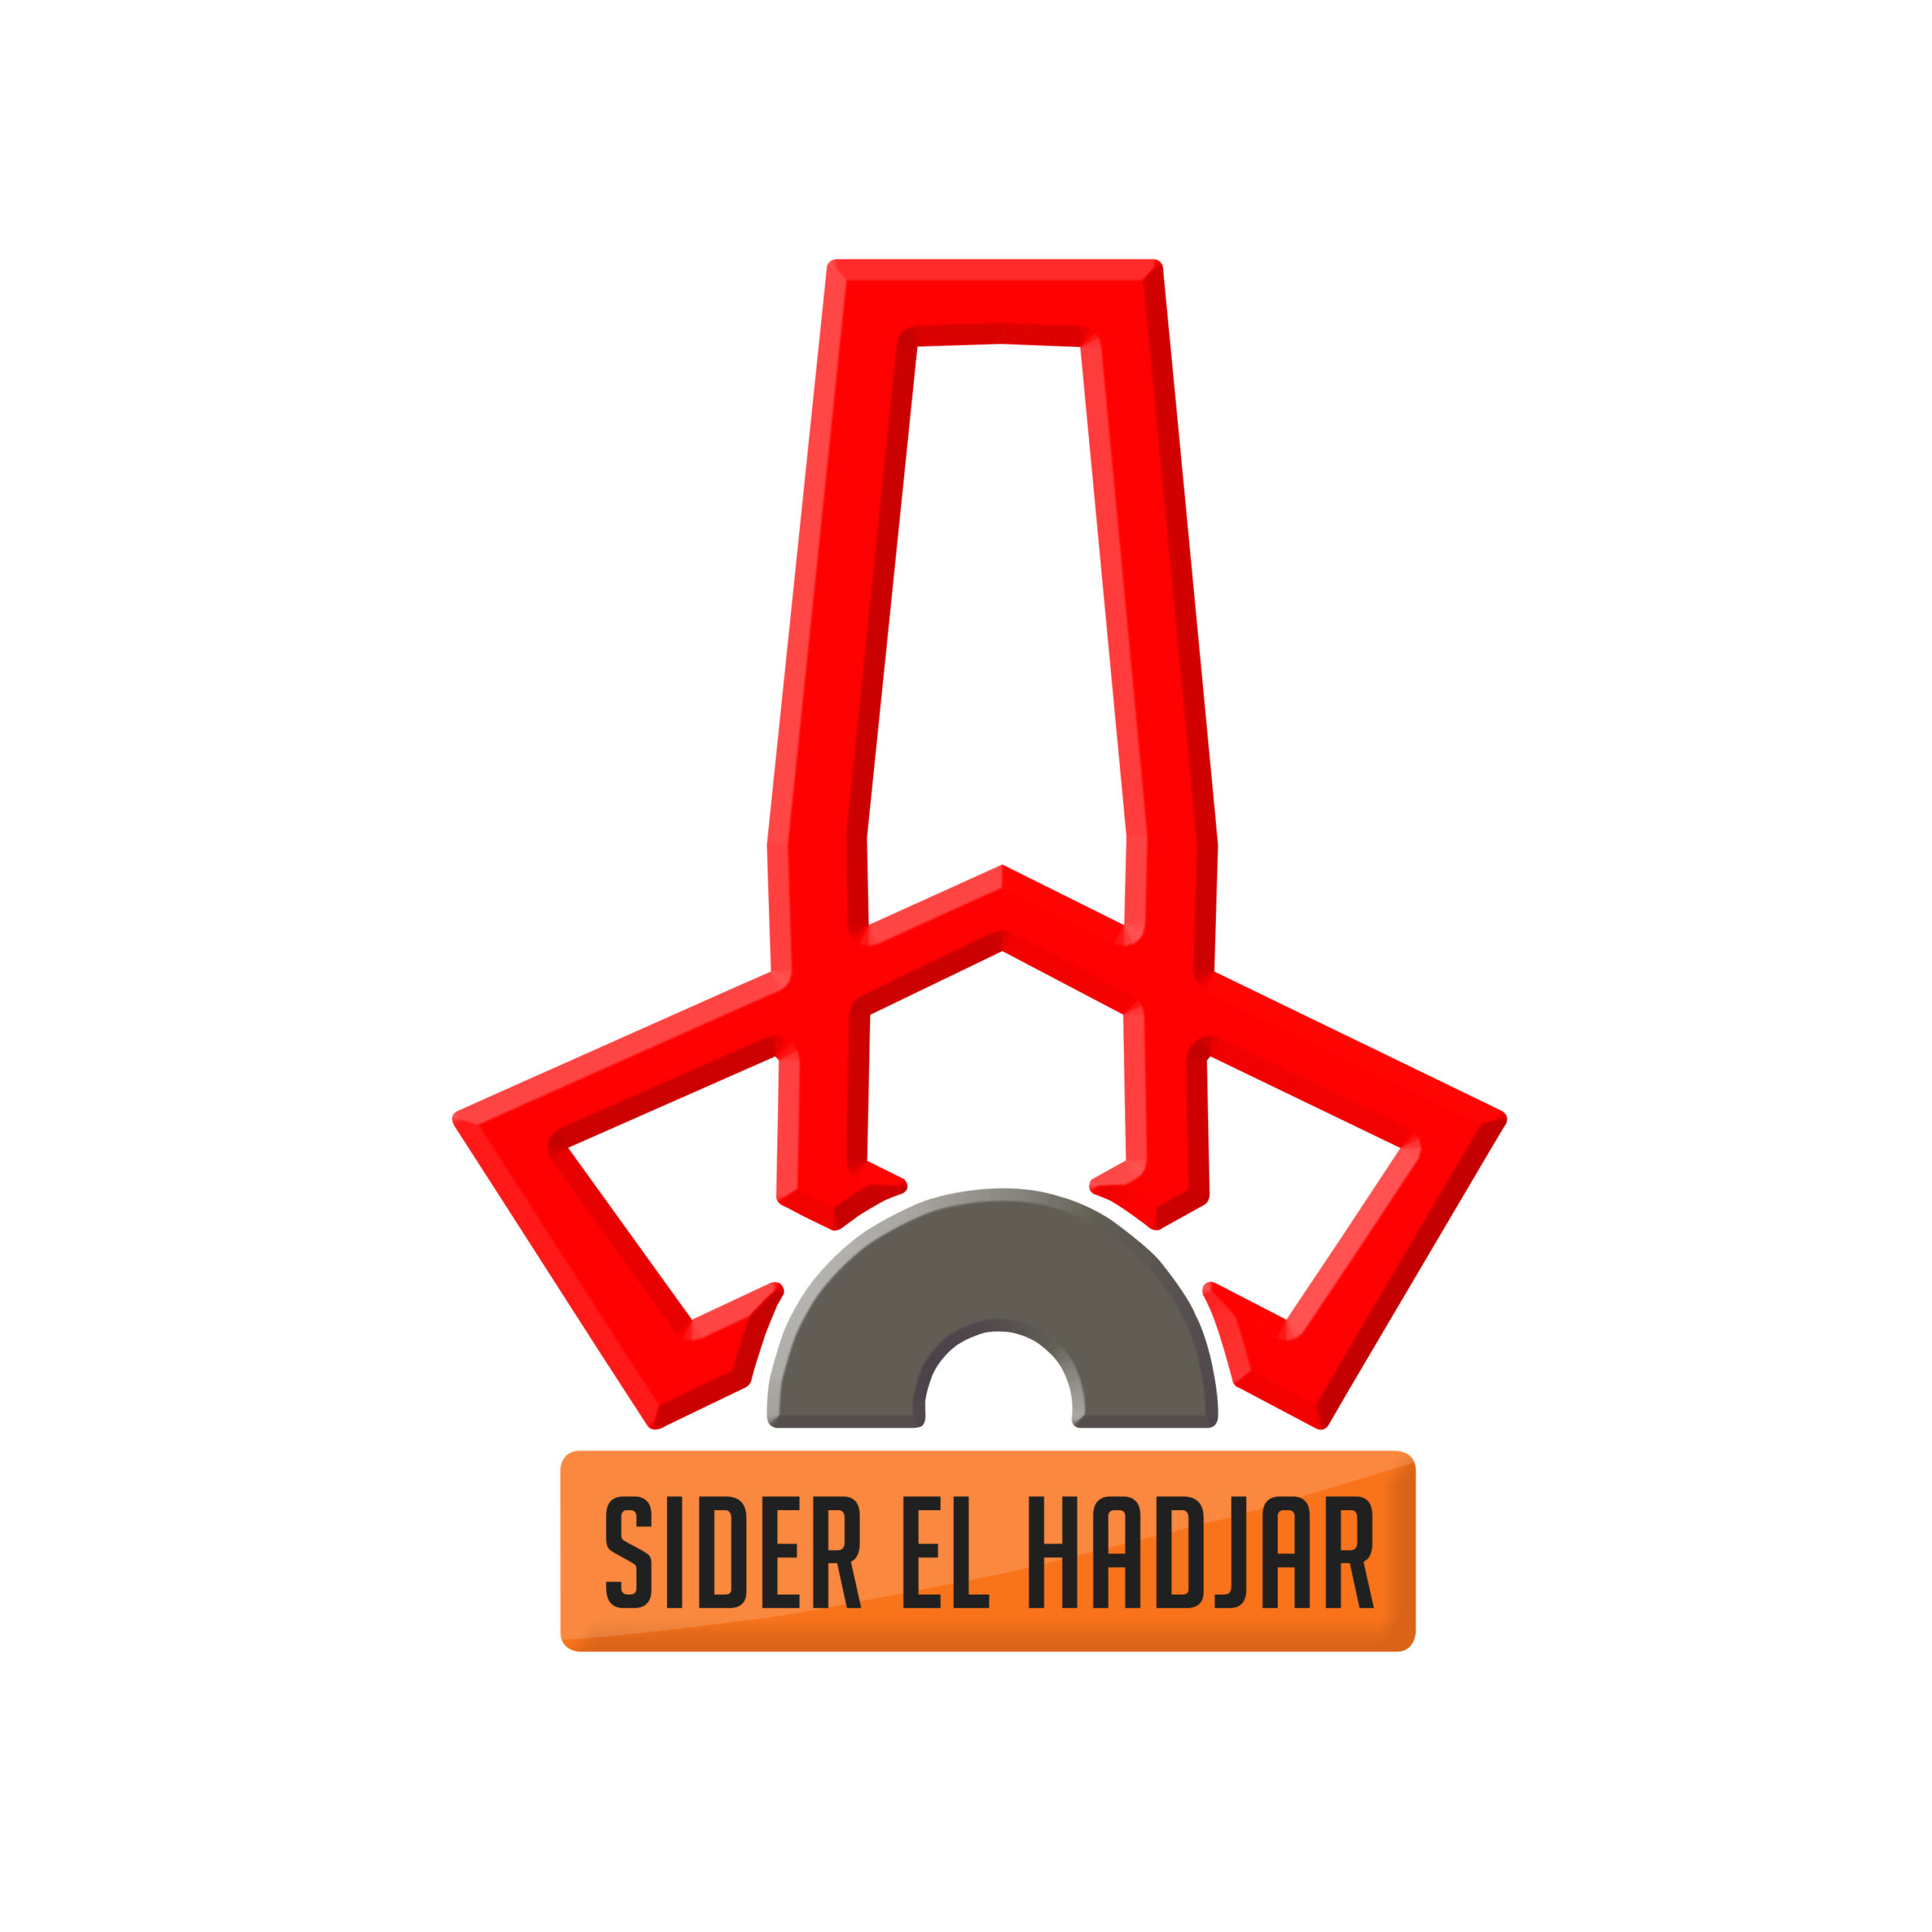 SIDER_EL_HADJAR